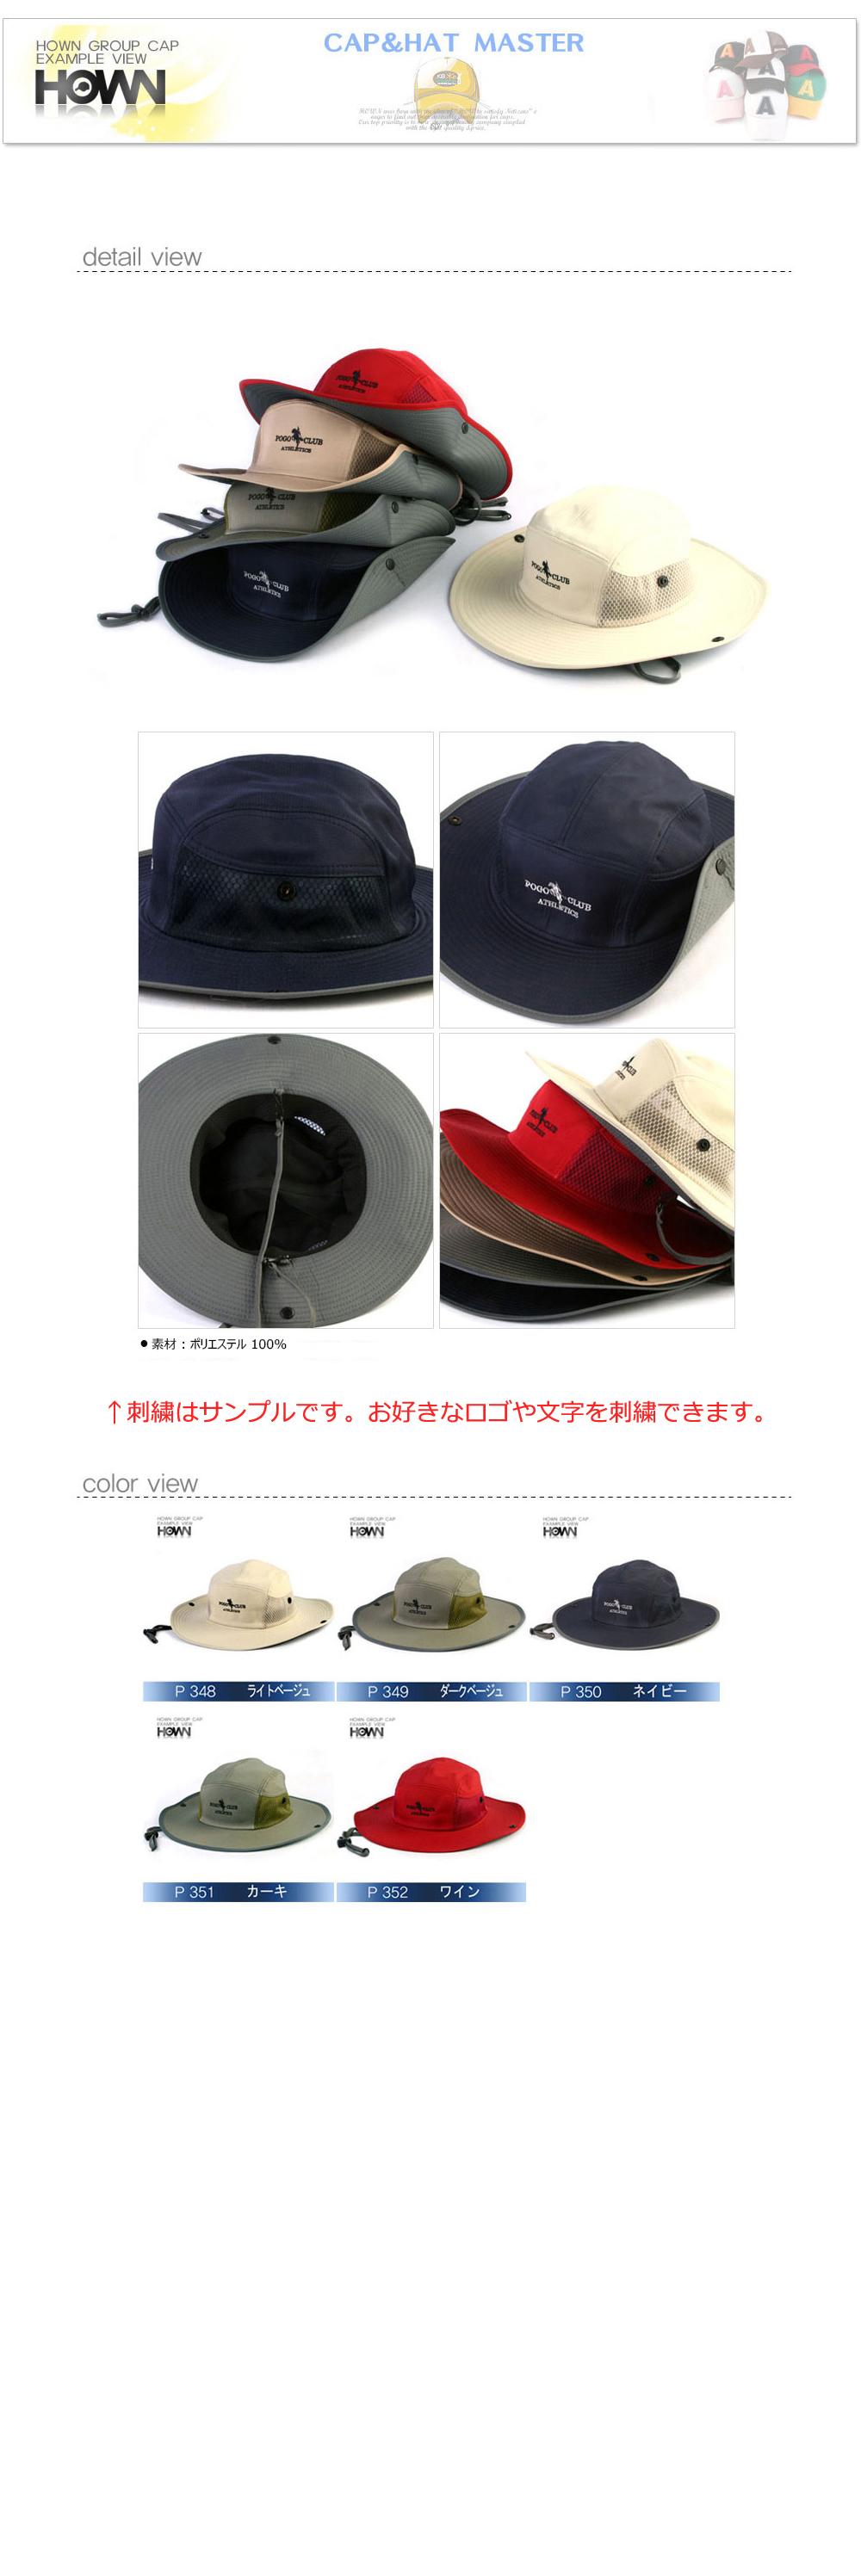 P348 P349 P350 P351 P352 1点から製作可能!本格的3D刺繍も!名前入れ 刺繍 プリント オリジナルキャップ 登山帽子 イベント用  学校行事 サークル  アウトドアハット 登山帽子に刺繍を!